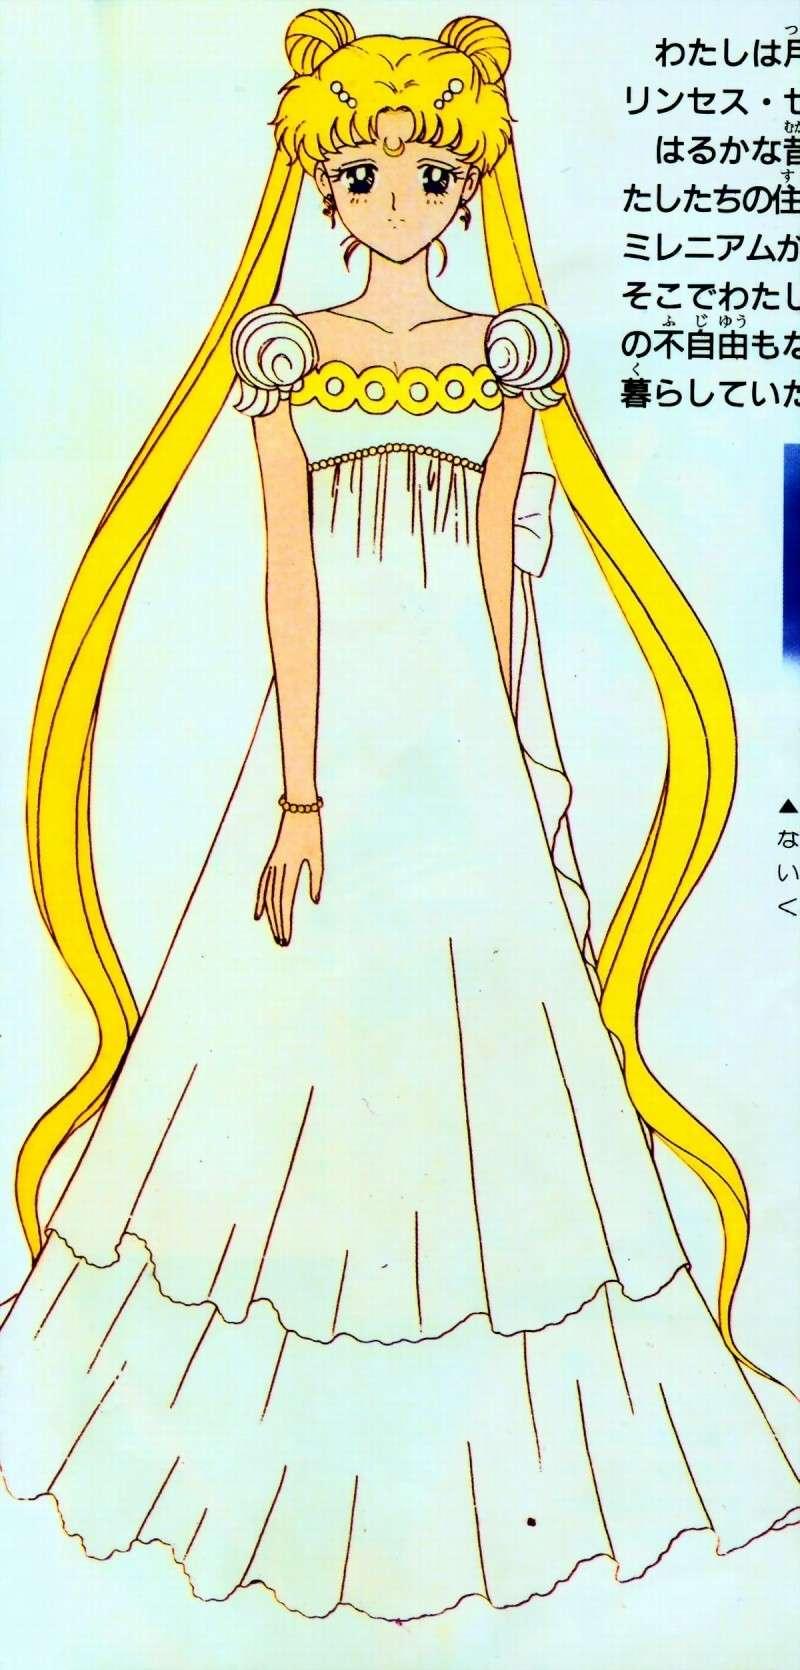 Sailor Moon/Usagi Tsukino Gallery 74656_10